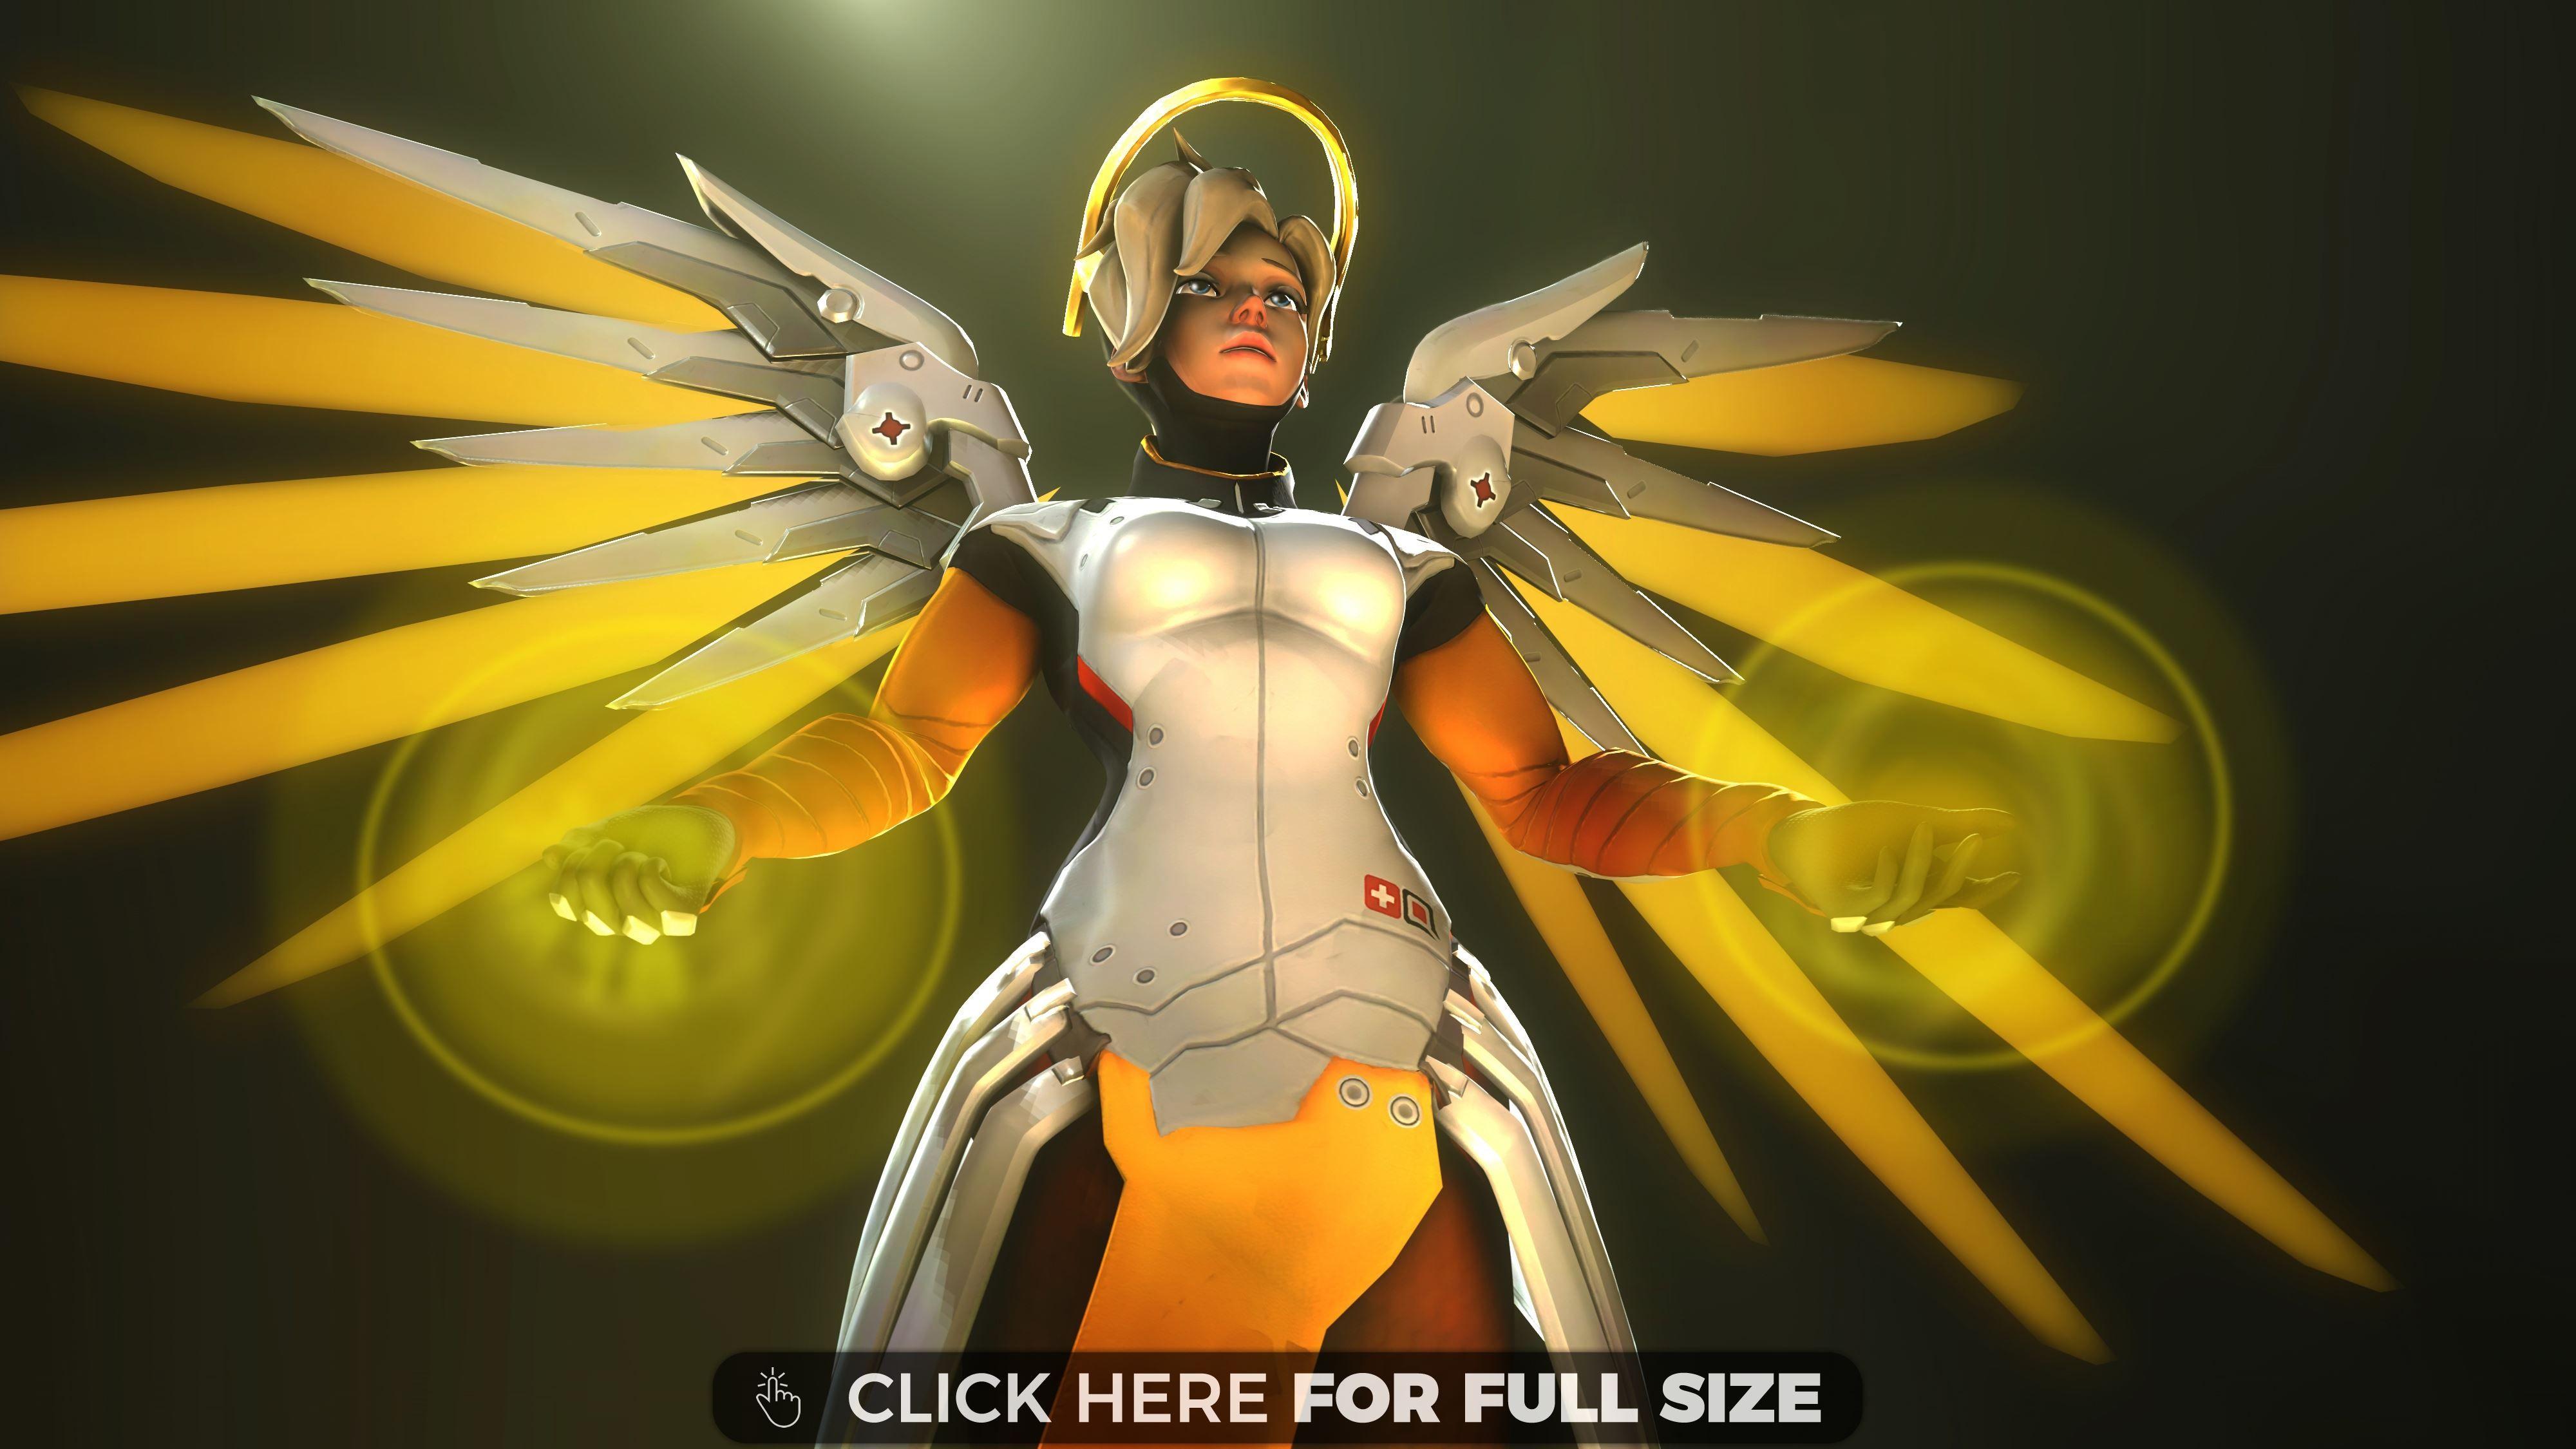 Mercy Overwatch 4k Mercy Overwatch Overwatch Wallpapers Overwatch